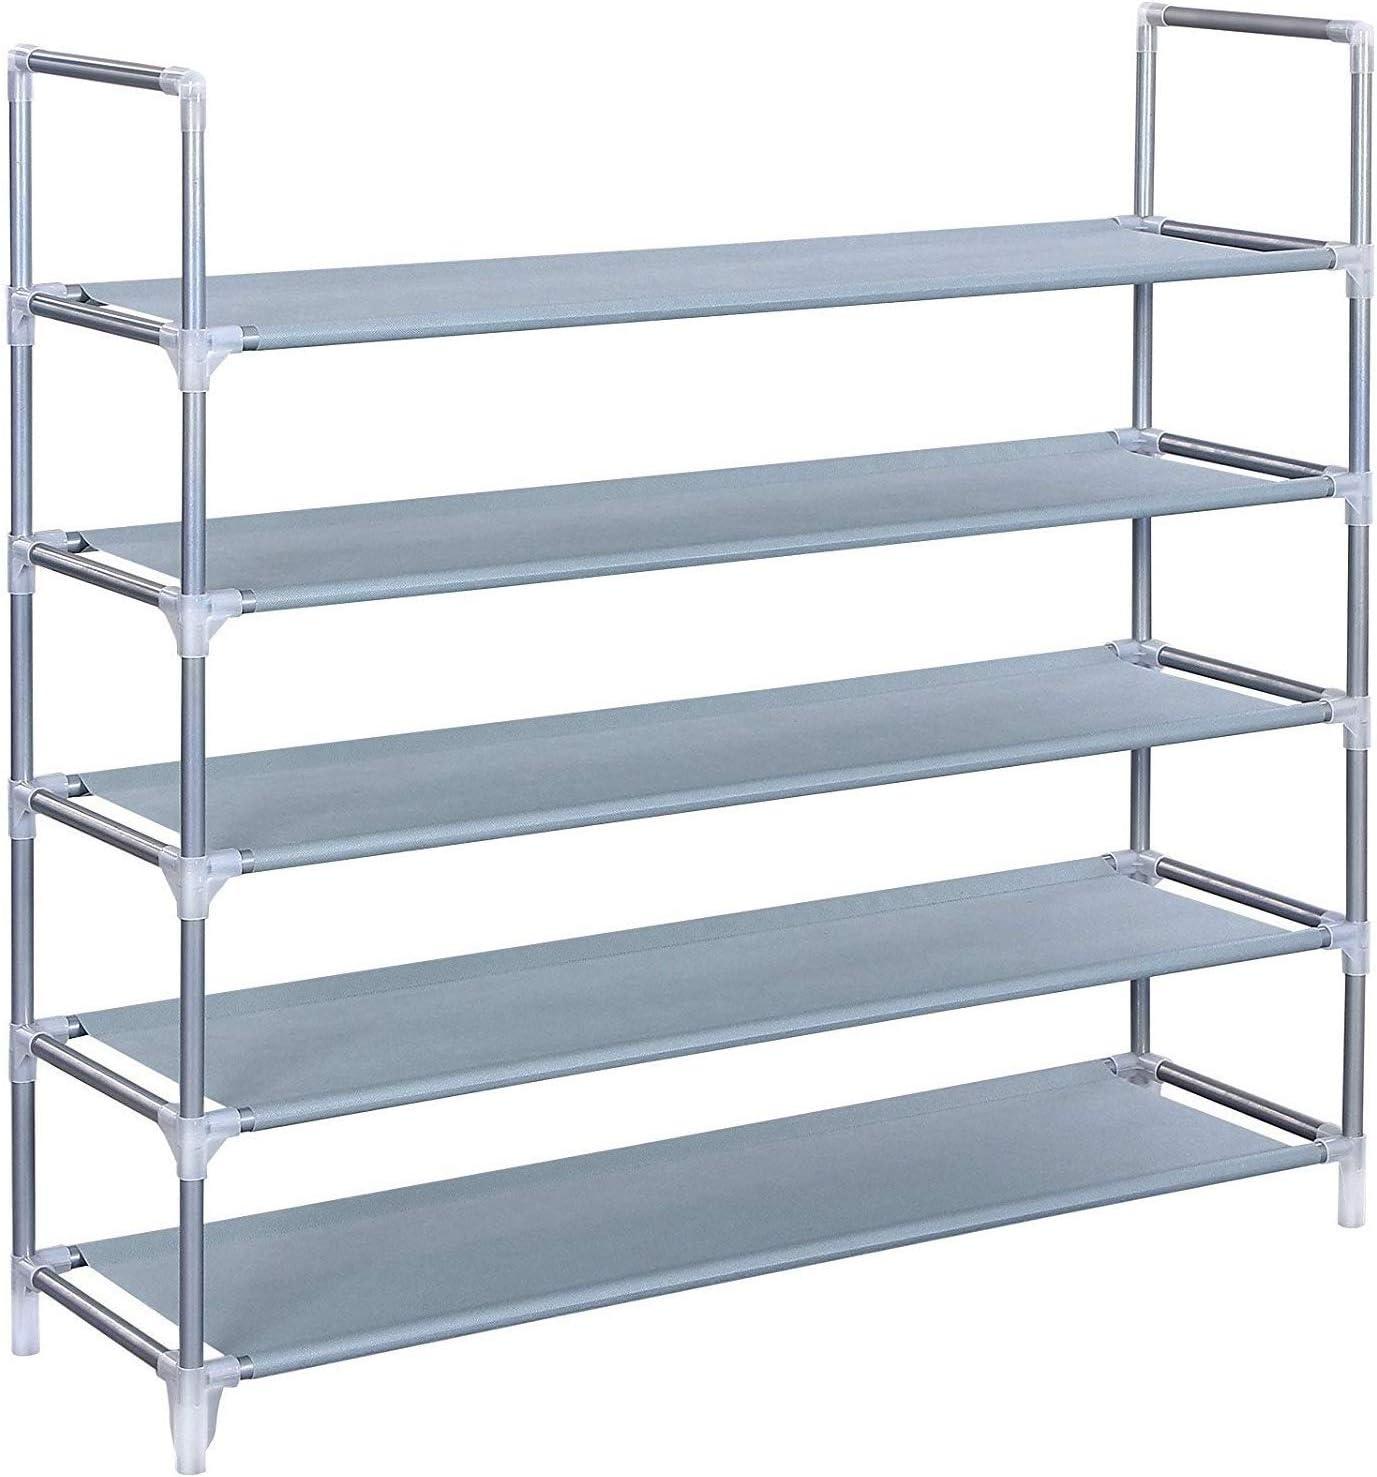 5 Tiers Shoe Organizer,Shoe Rack,Closet Shoe Organizer, Space Saving Shoe Tower Cabinet Stackable Shelves